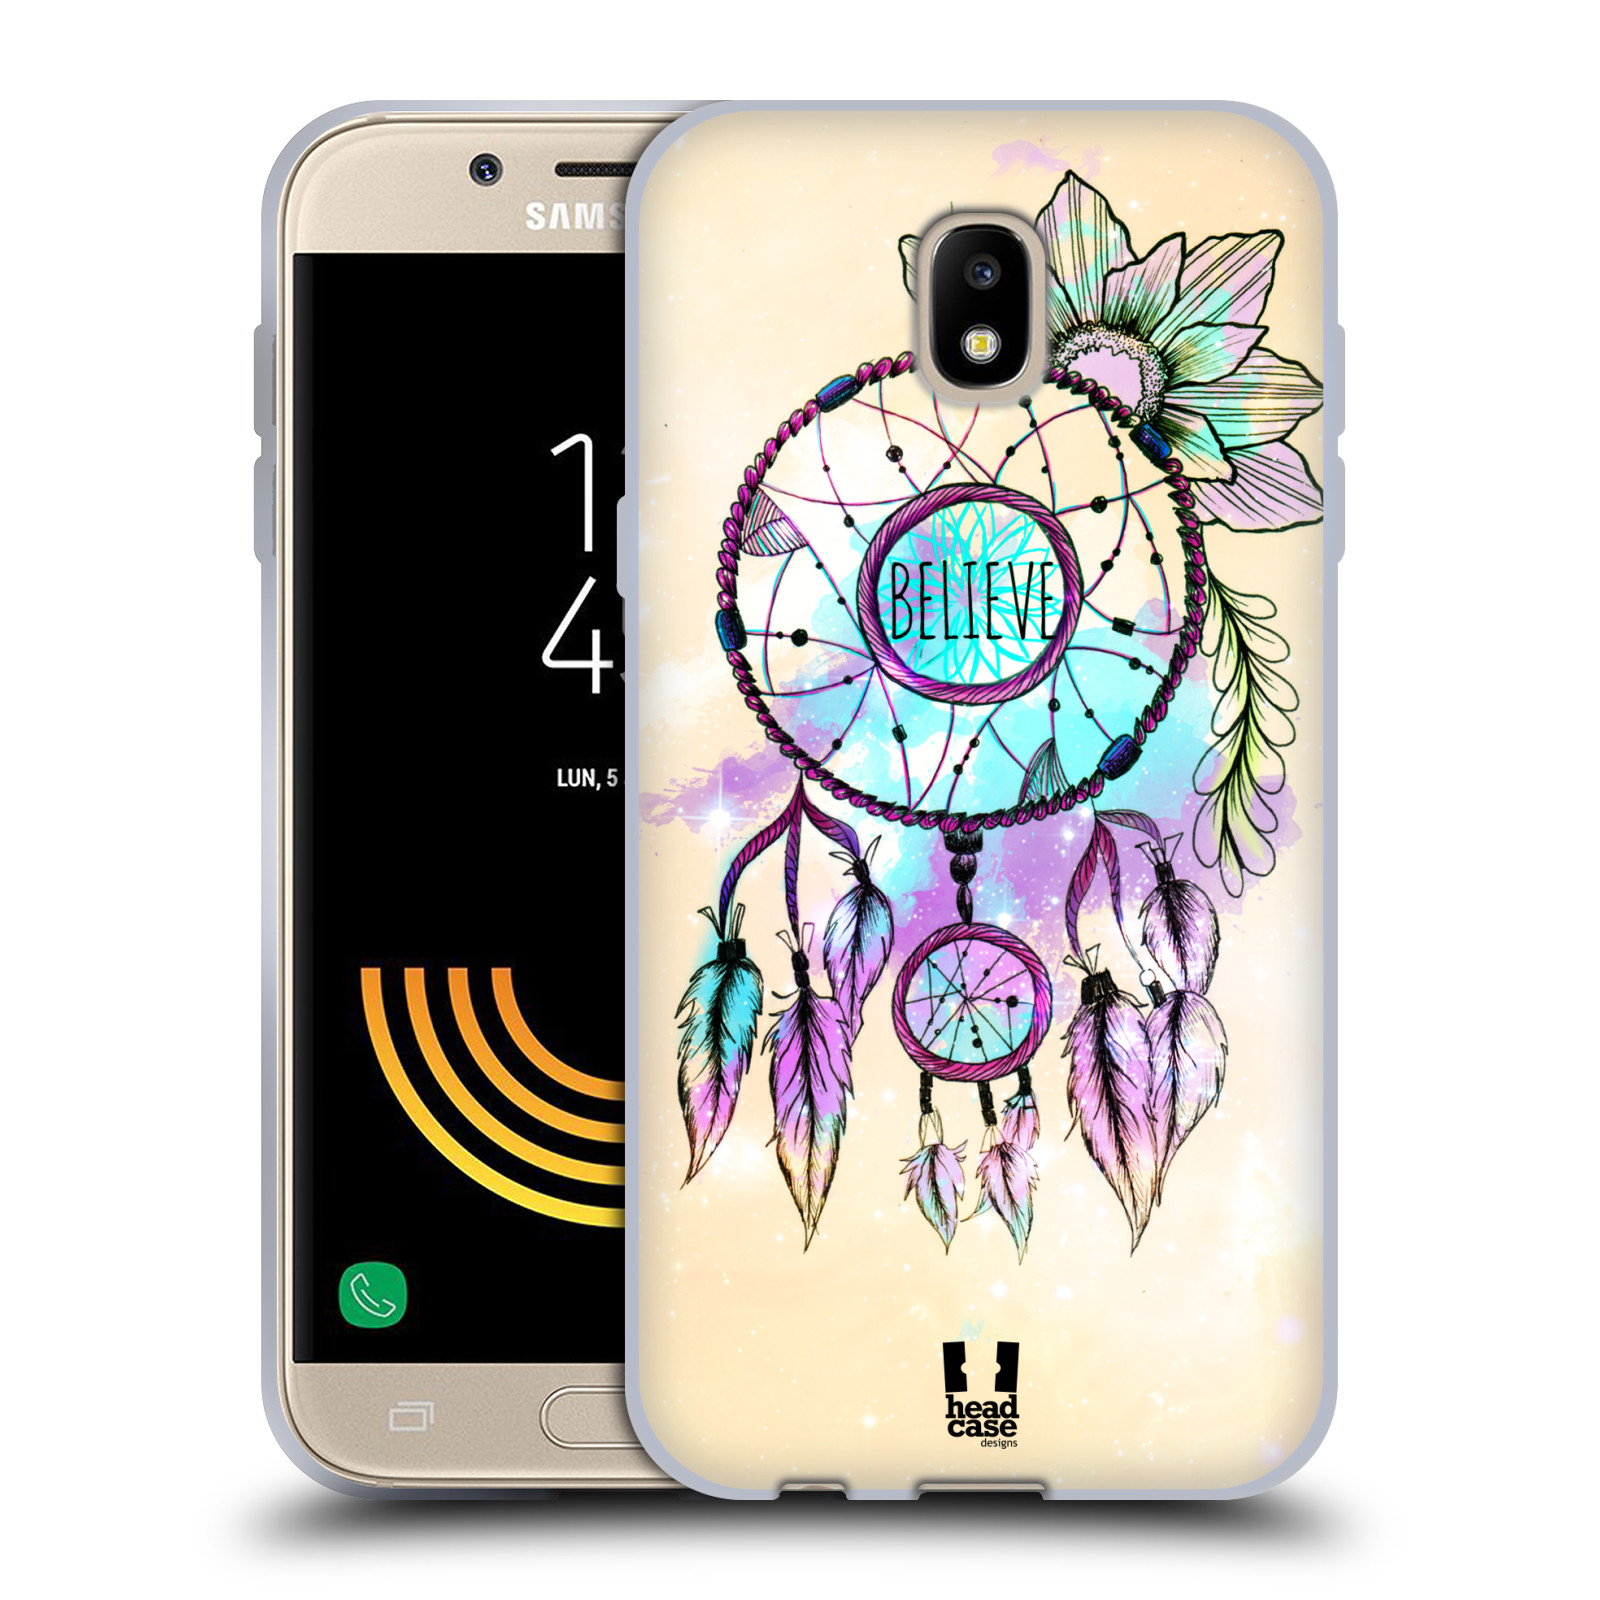 Silikonové pouzdro na mobil Samsung Galaxy J5 (2017) - Head Case - MIX BELIEVE